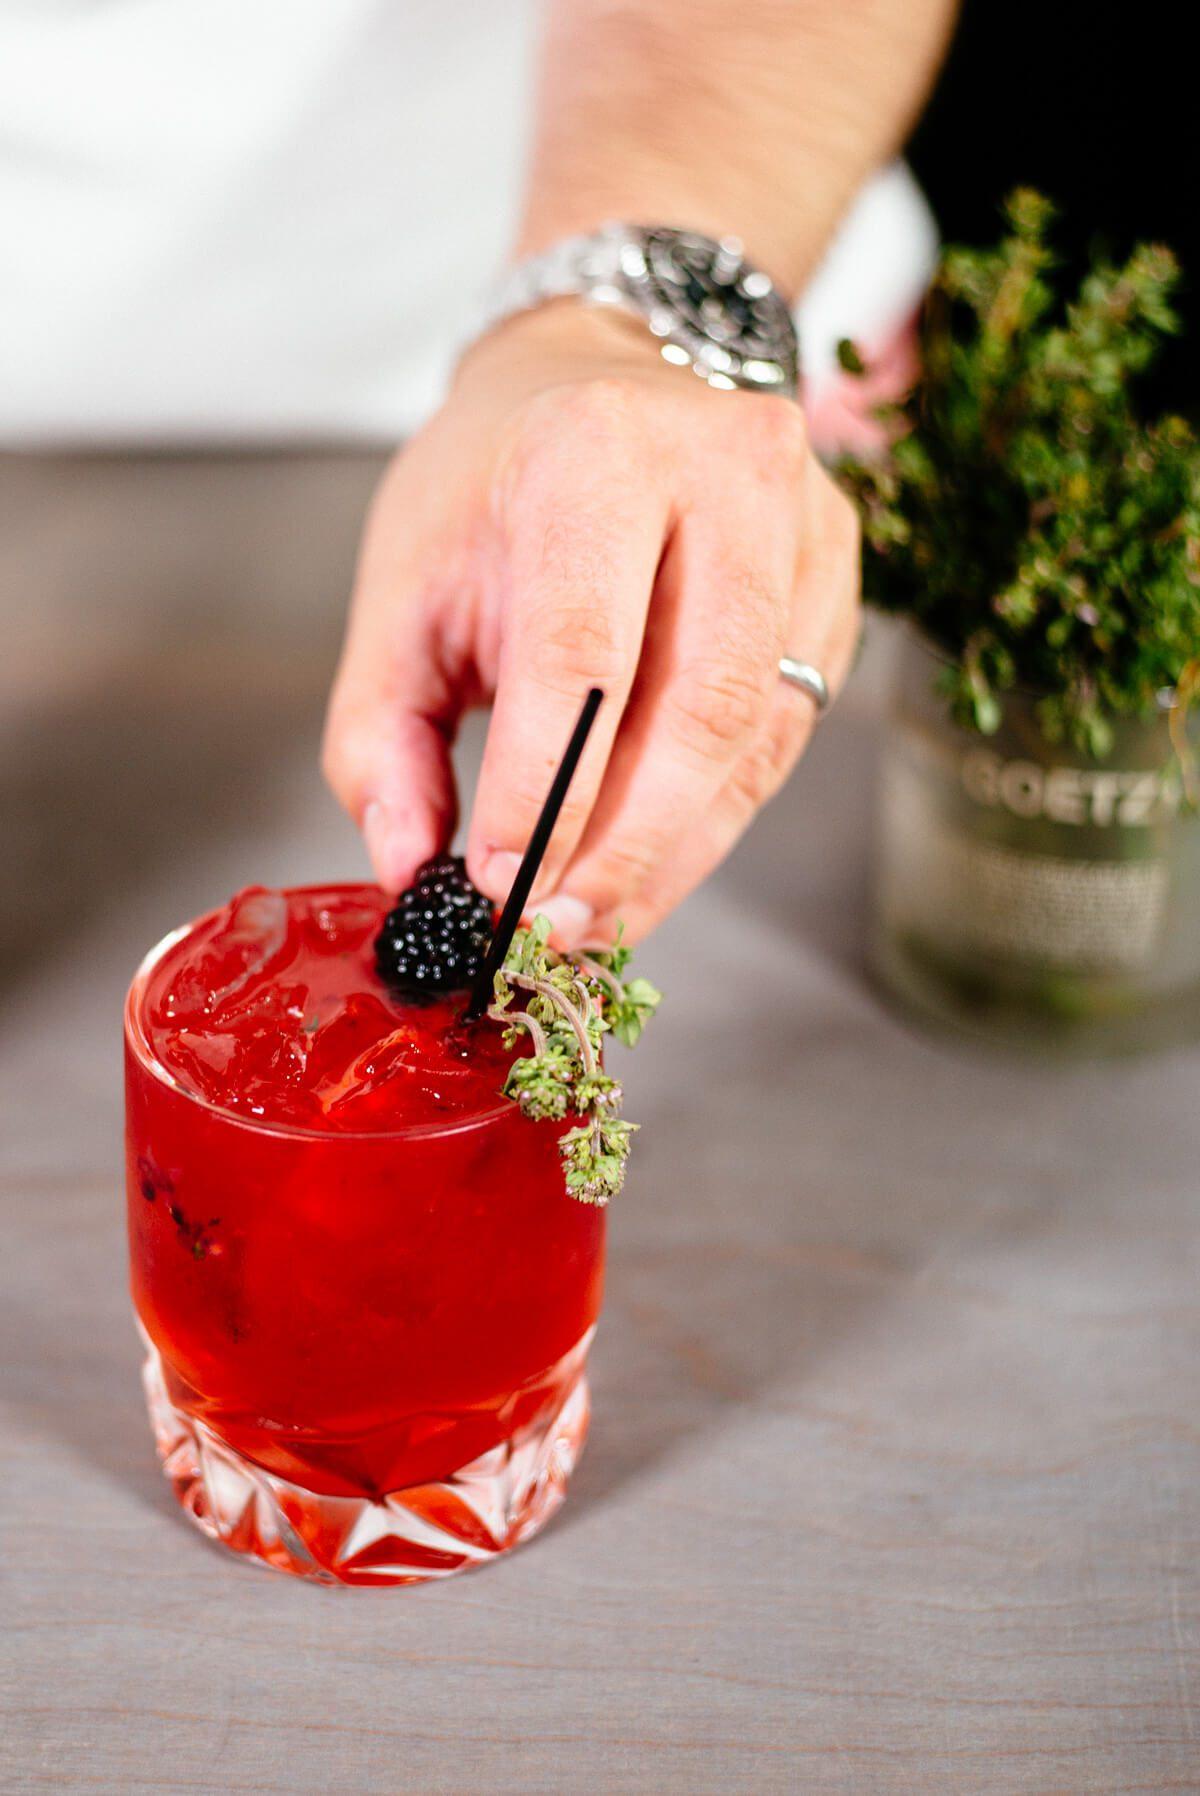 Garnishing the blackberry elderflower gin and tonic.